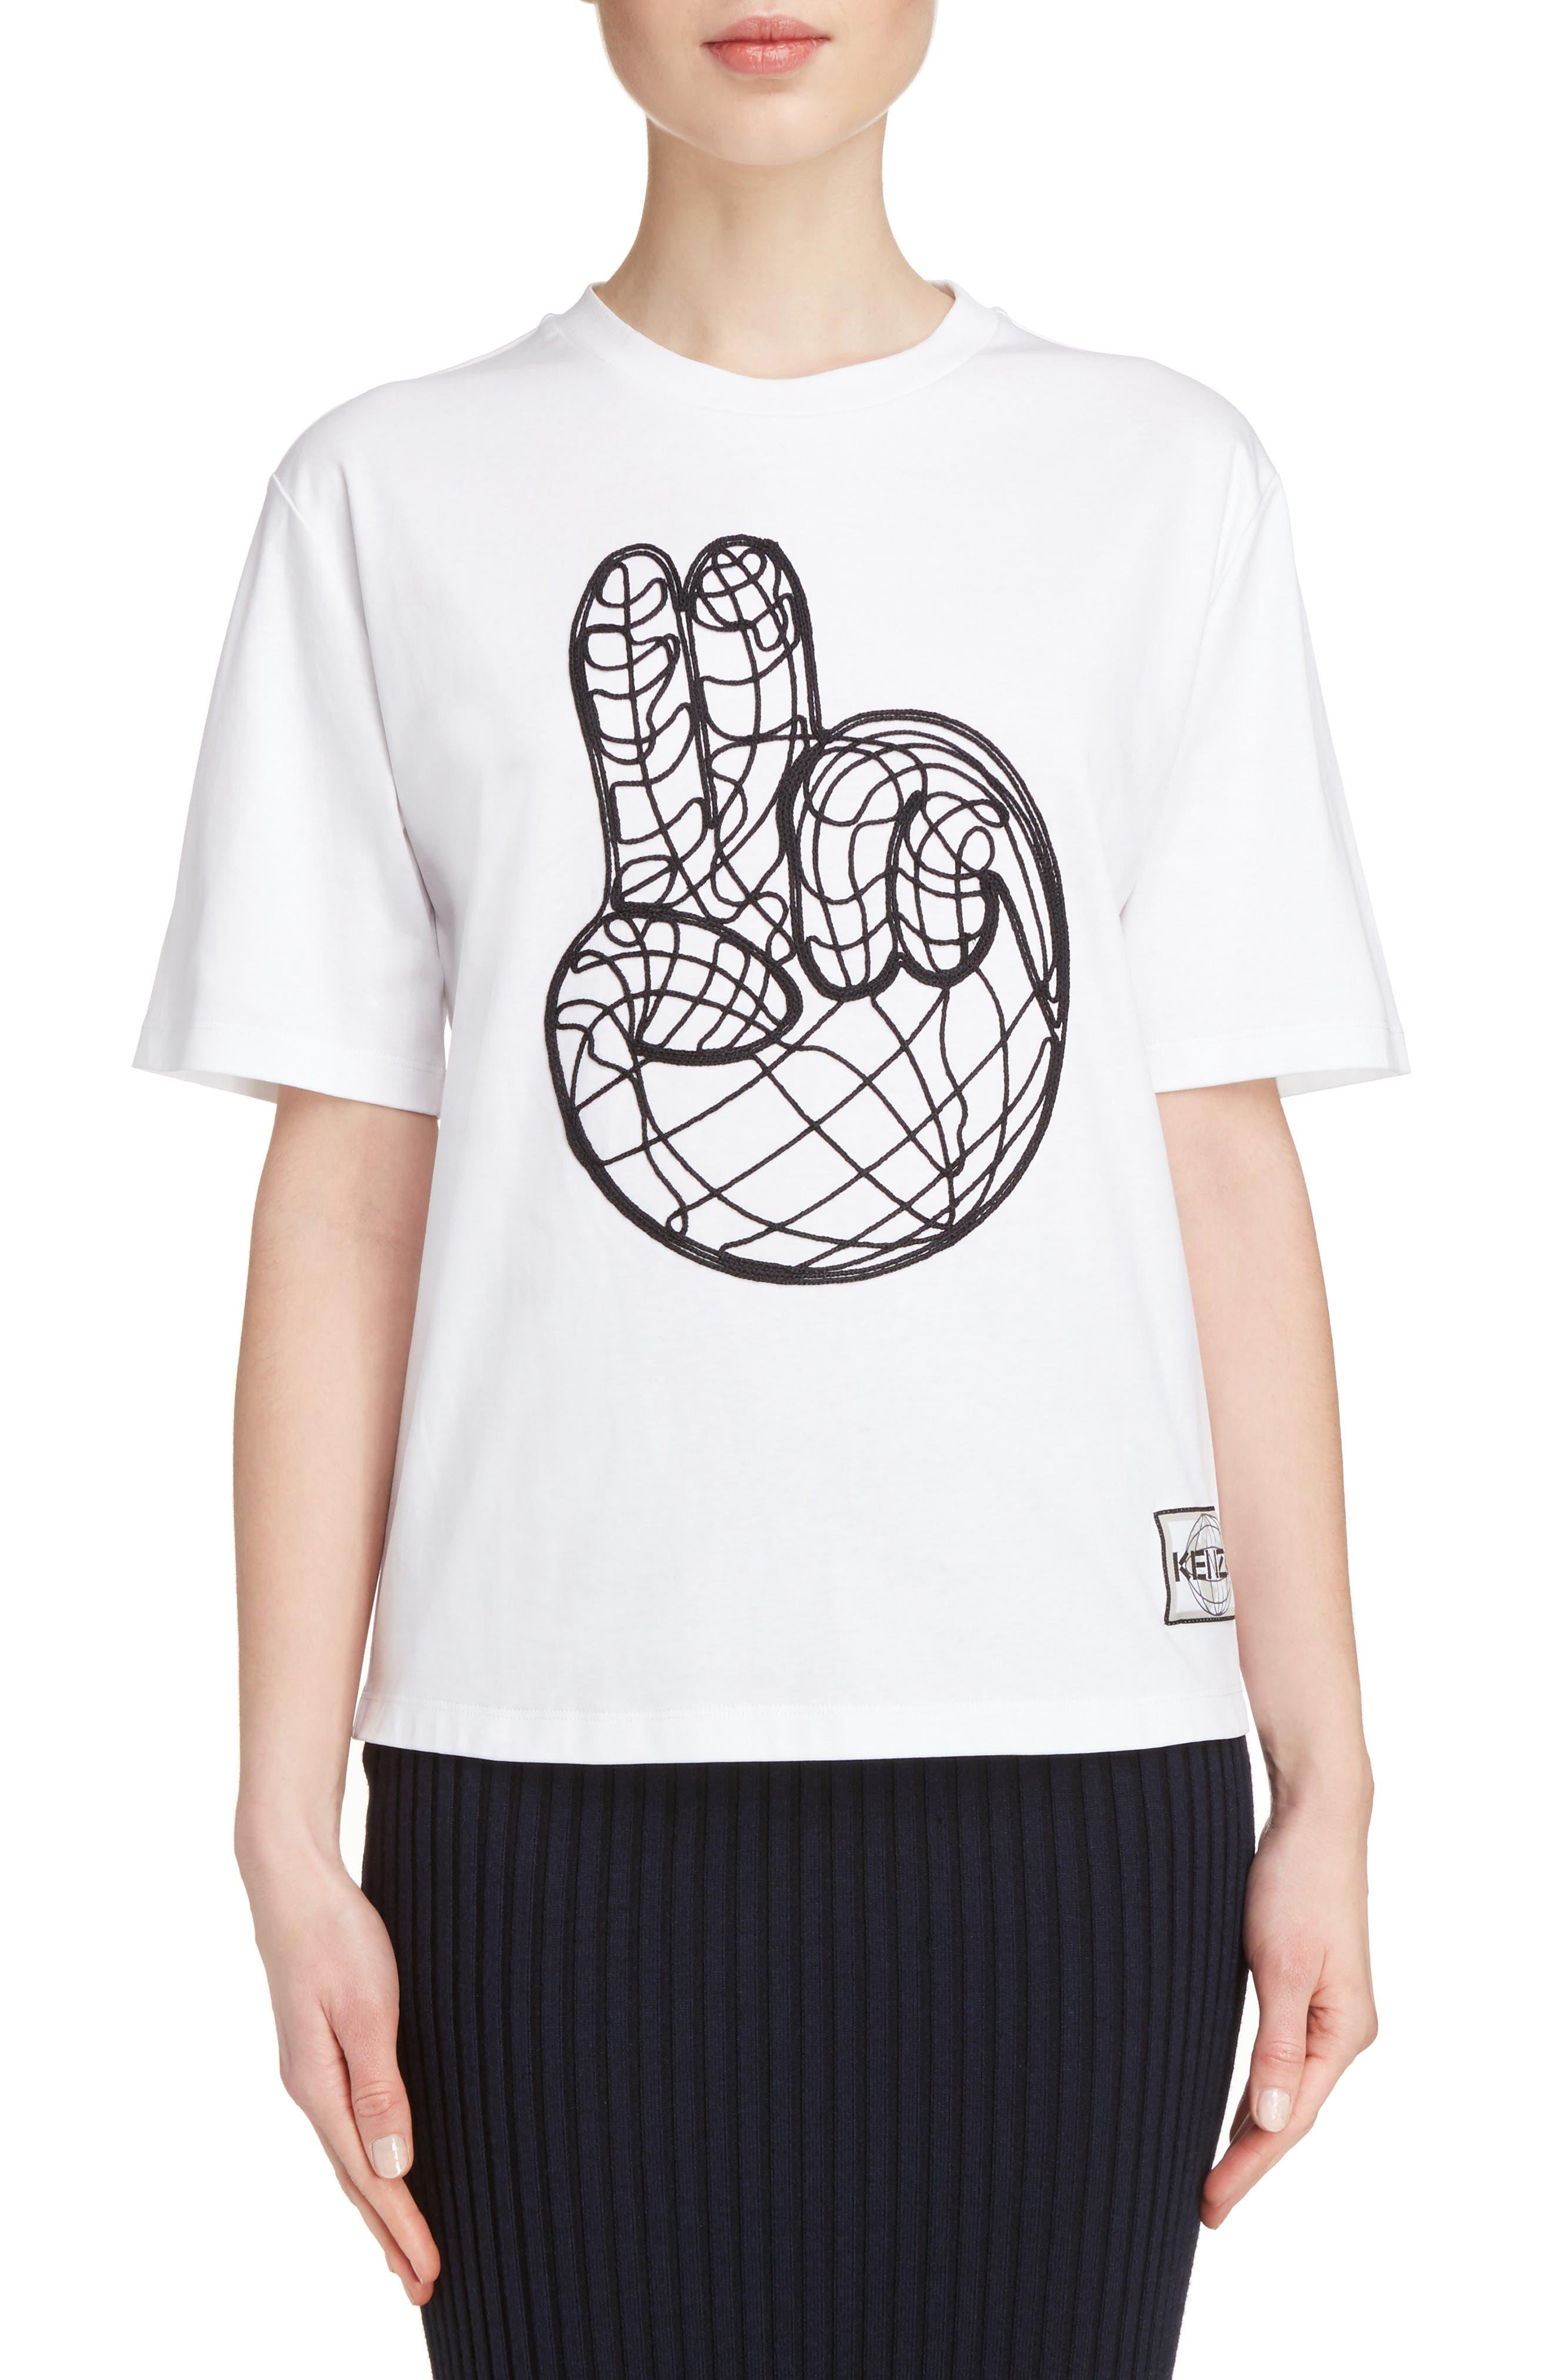 Main Image - KENZO Peace World Embroidered Cotton Tee